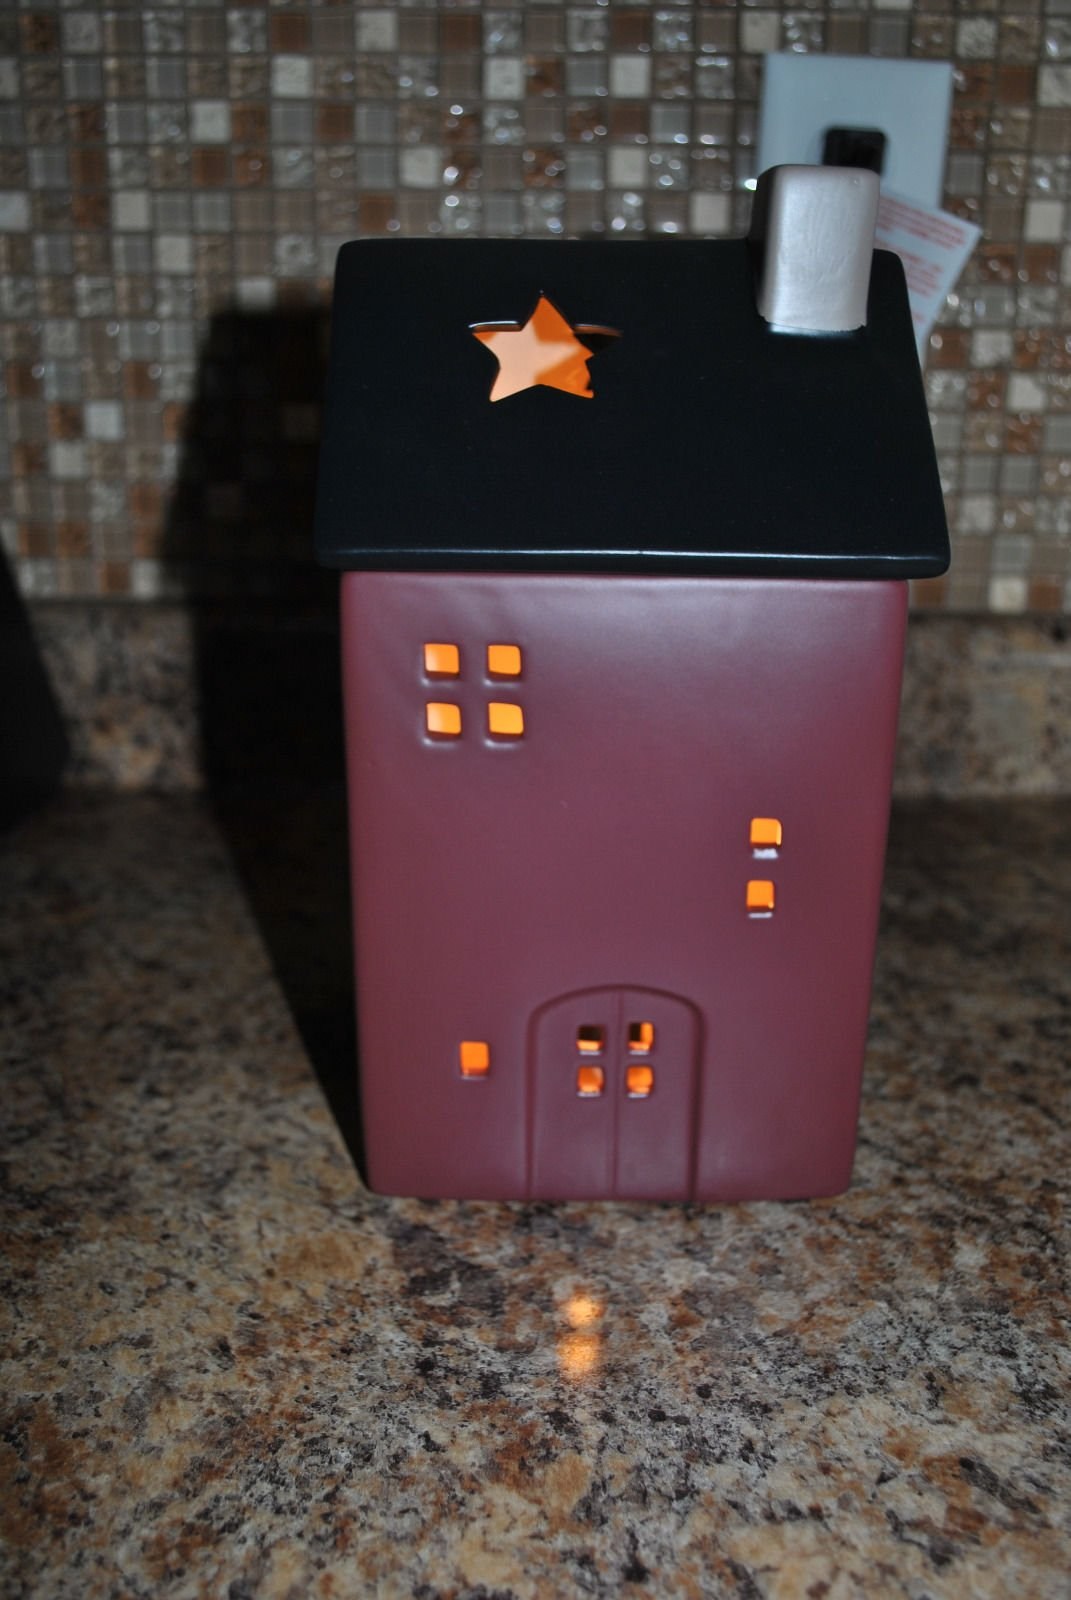 Scentsy Premium Warmer (No Place Like Home Premium Warmer)